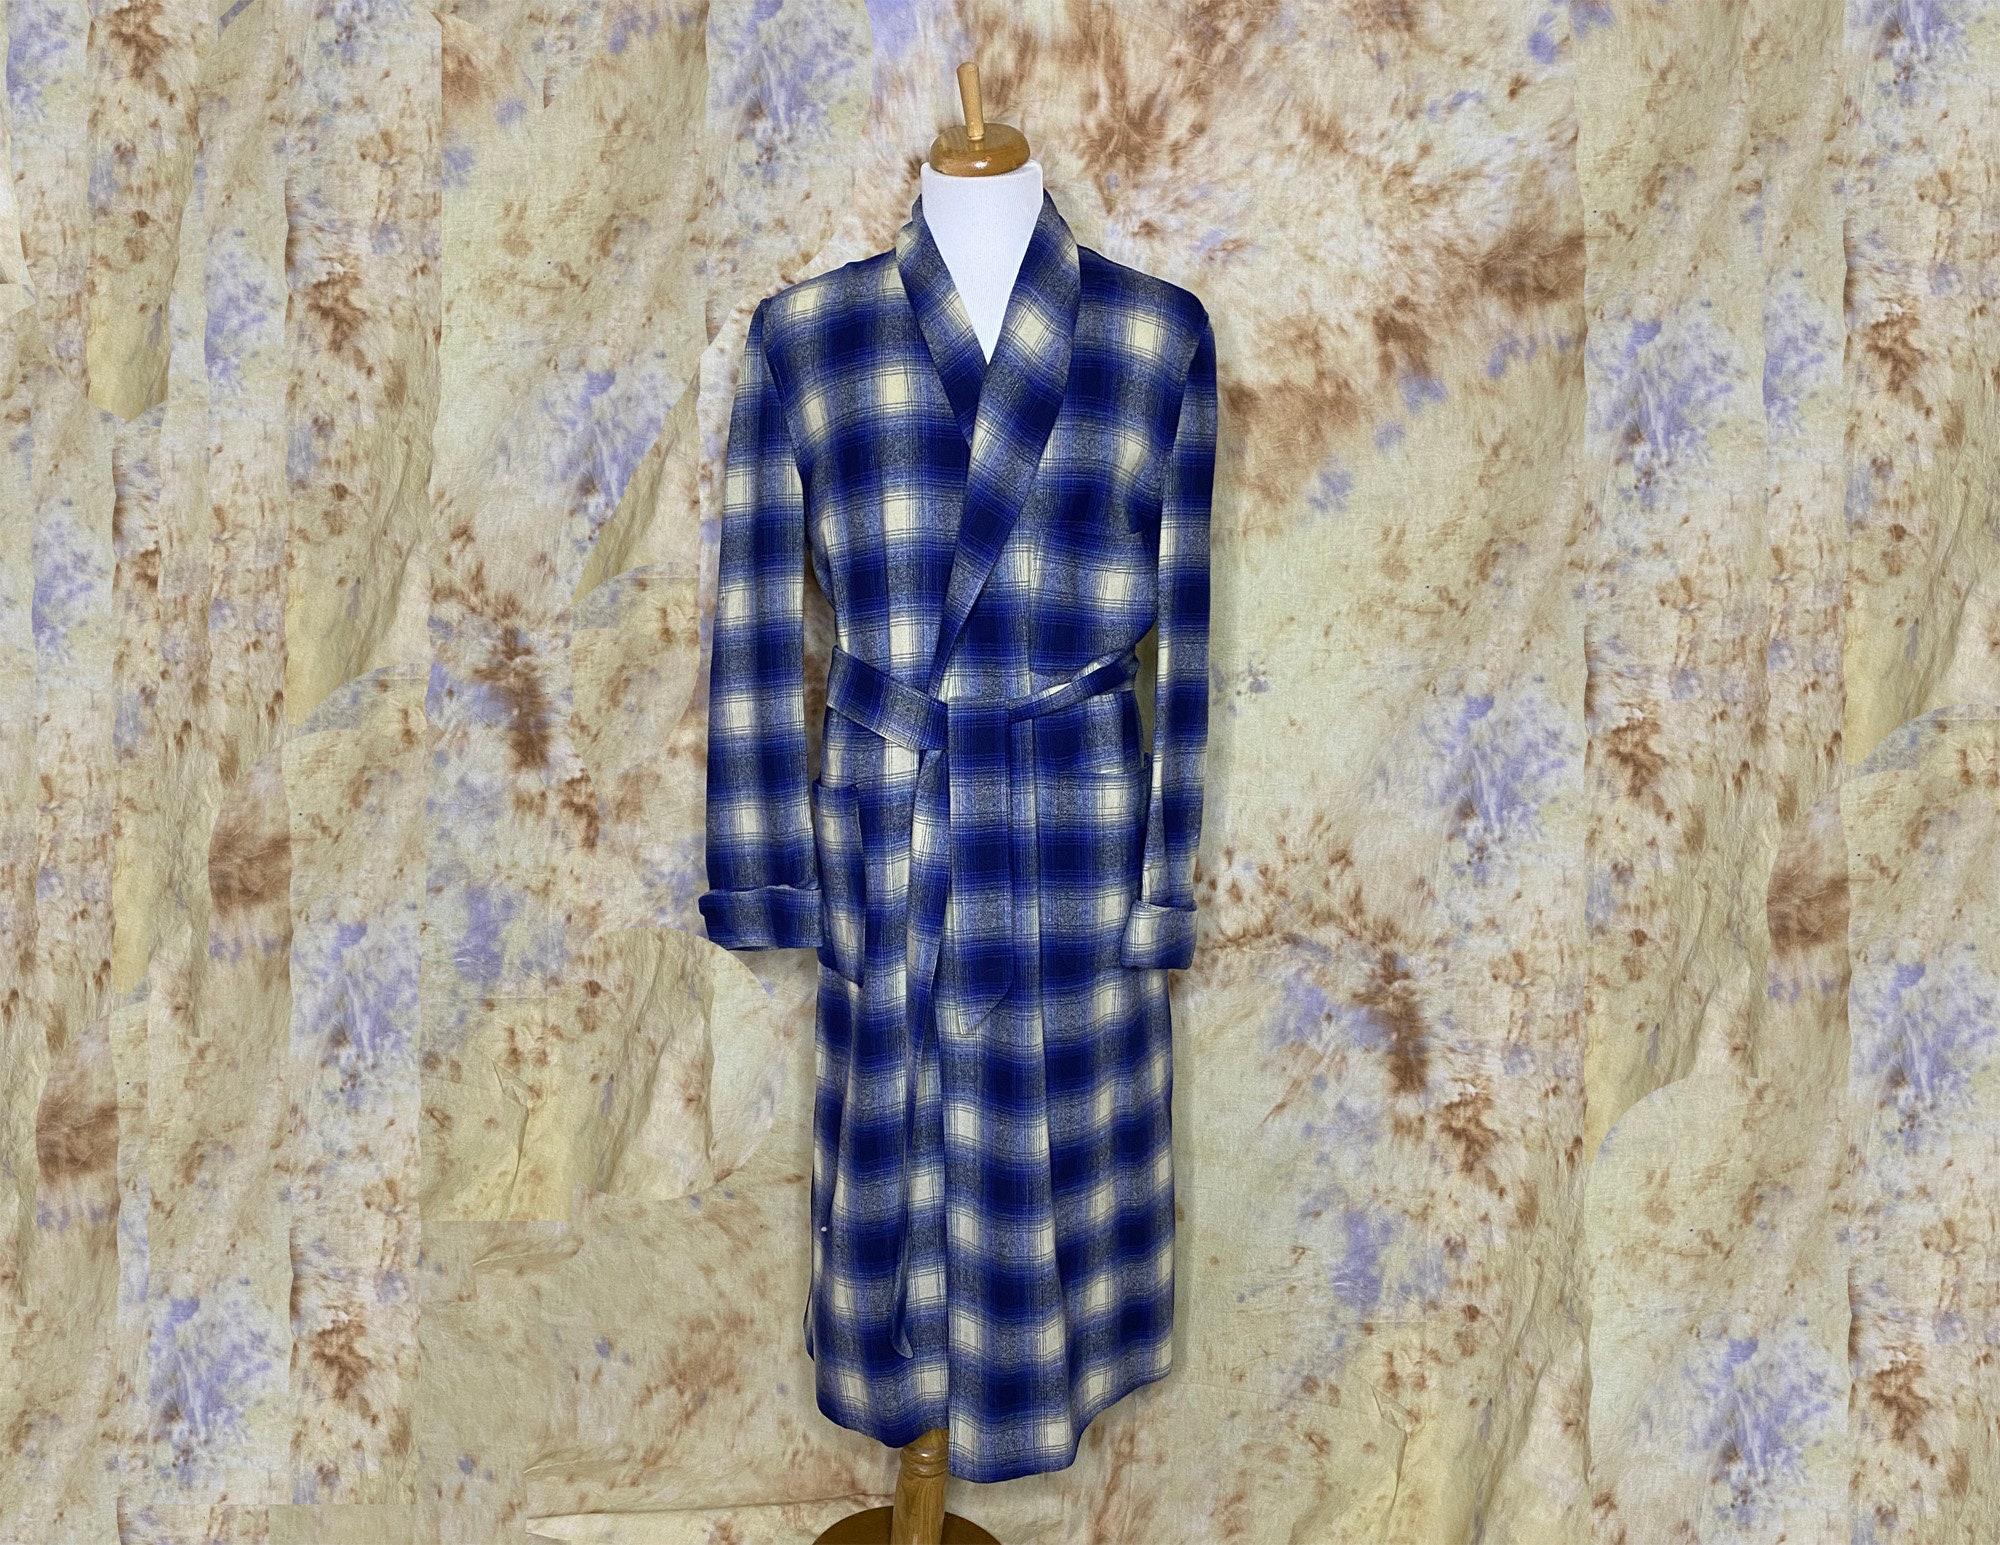 1950s Men's Ties, Bow Ties – Vintage, Skinny, Knit Vintage Unisex Robe, Blue Plaid, Wool Blend, 1950S, Royal Robes, Sash Belt, Mens SmallWomens Medium $40.00 AT vintagedancer.com